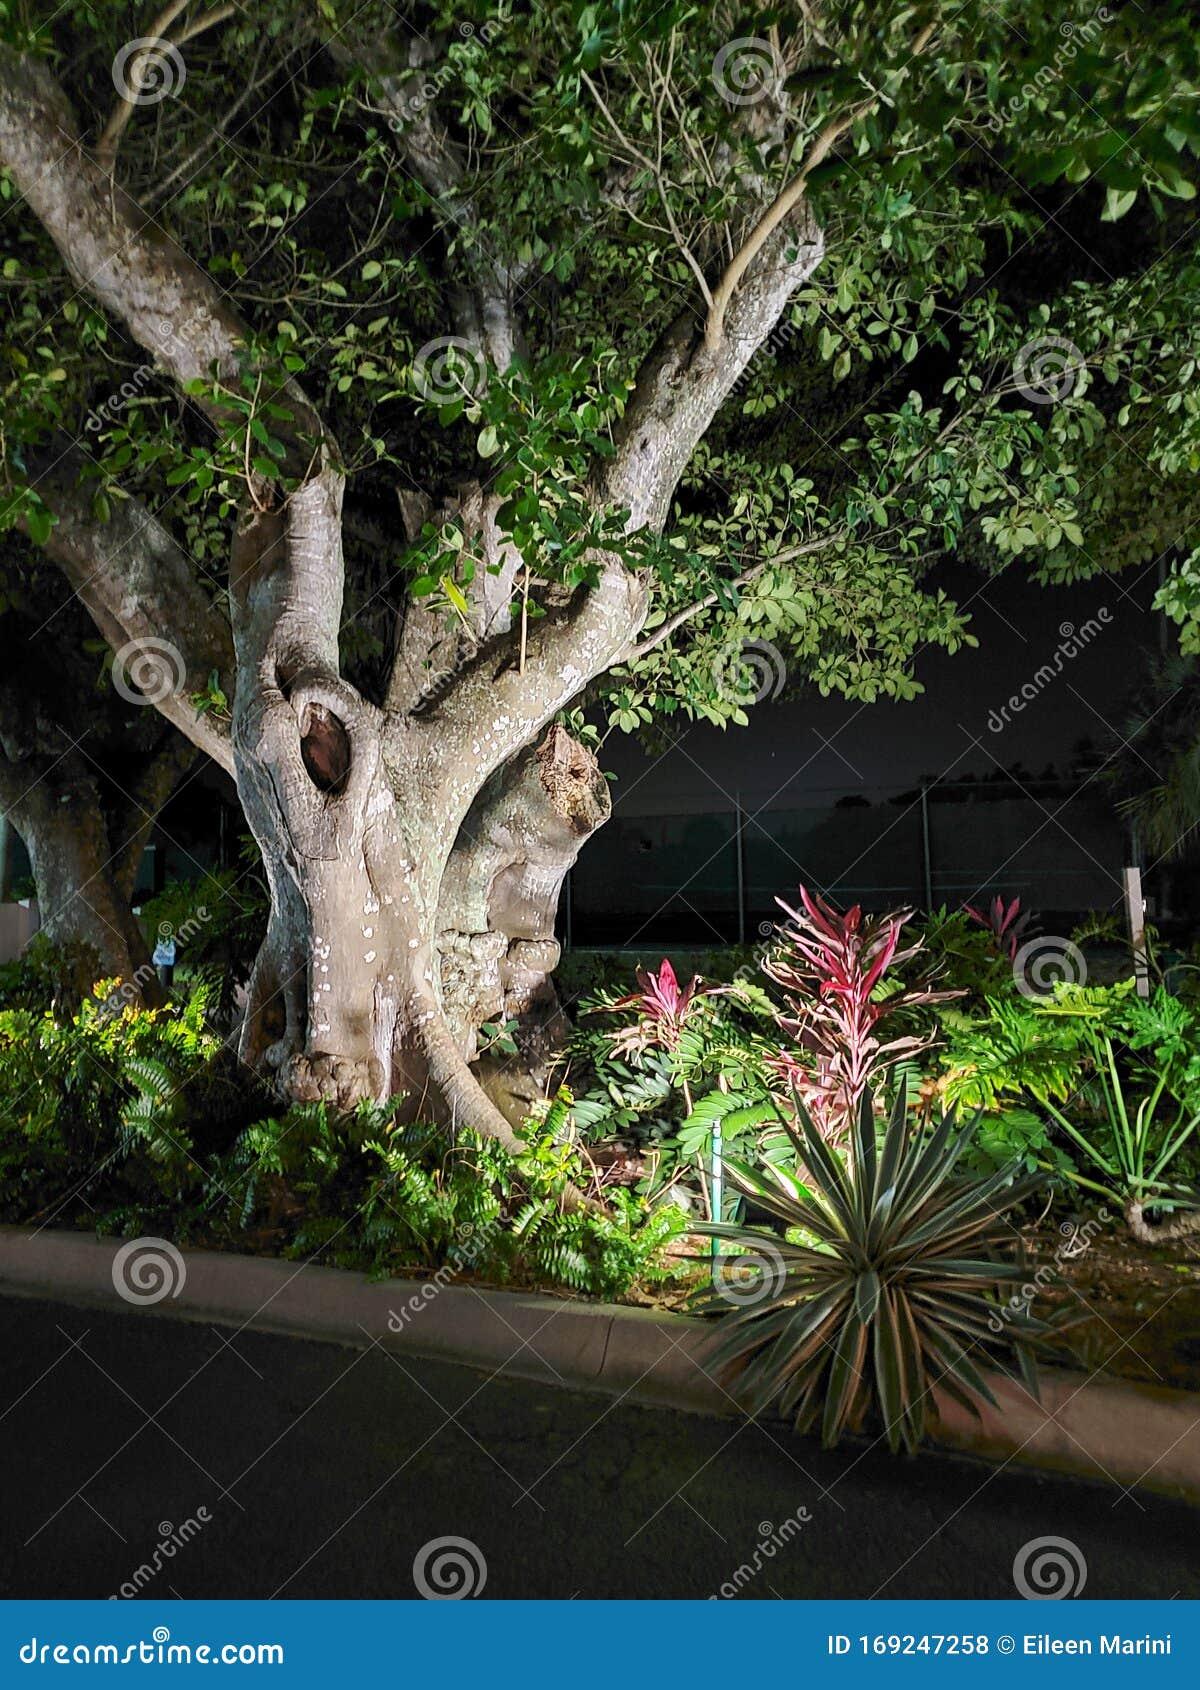 Kapok On Tree Royalty-Free Stock Image | CartoonDealer.com ...